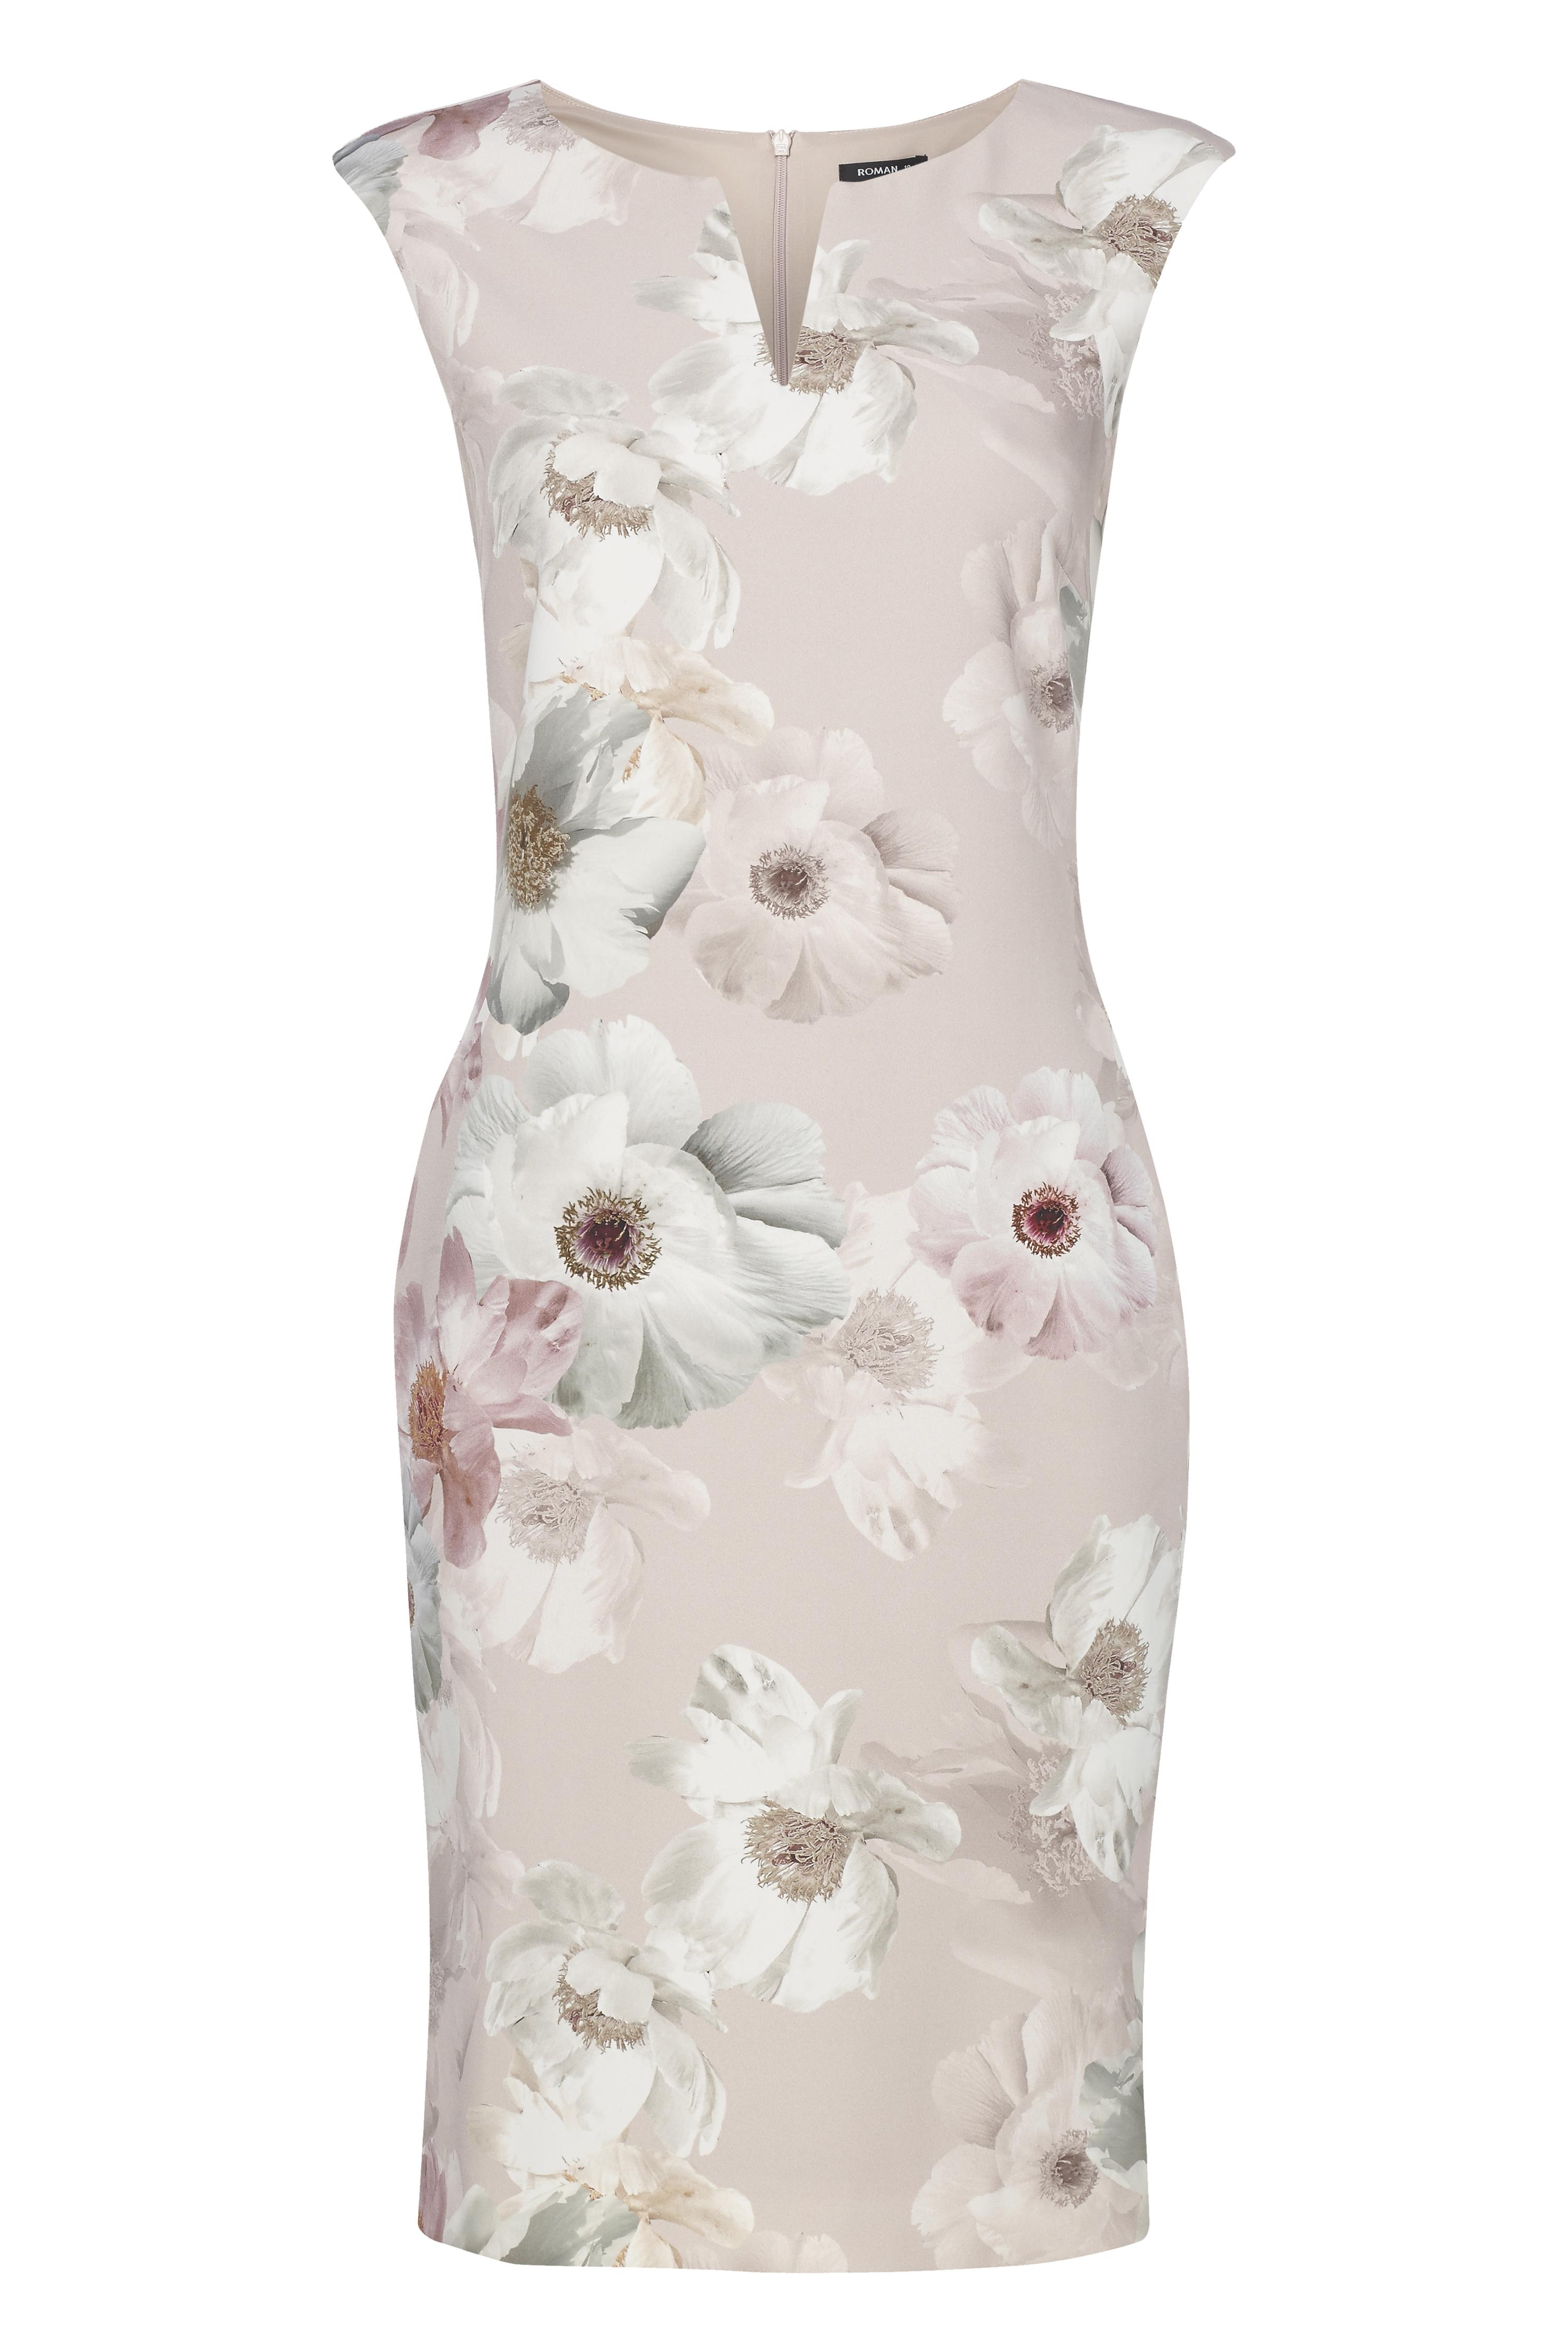 Roman-Originals-Womens-Light-Pink-Floral-All-Over-Print-Scuba-Dress-Sizes-10-20 thumbnail 16